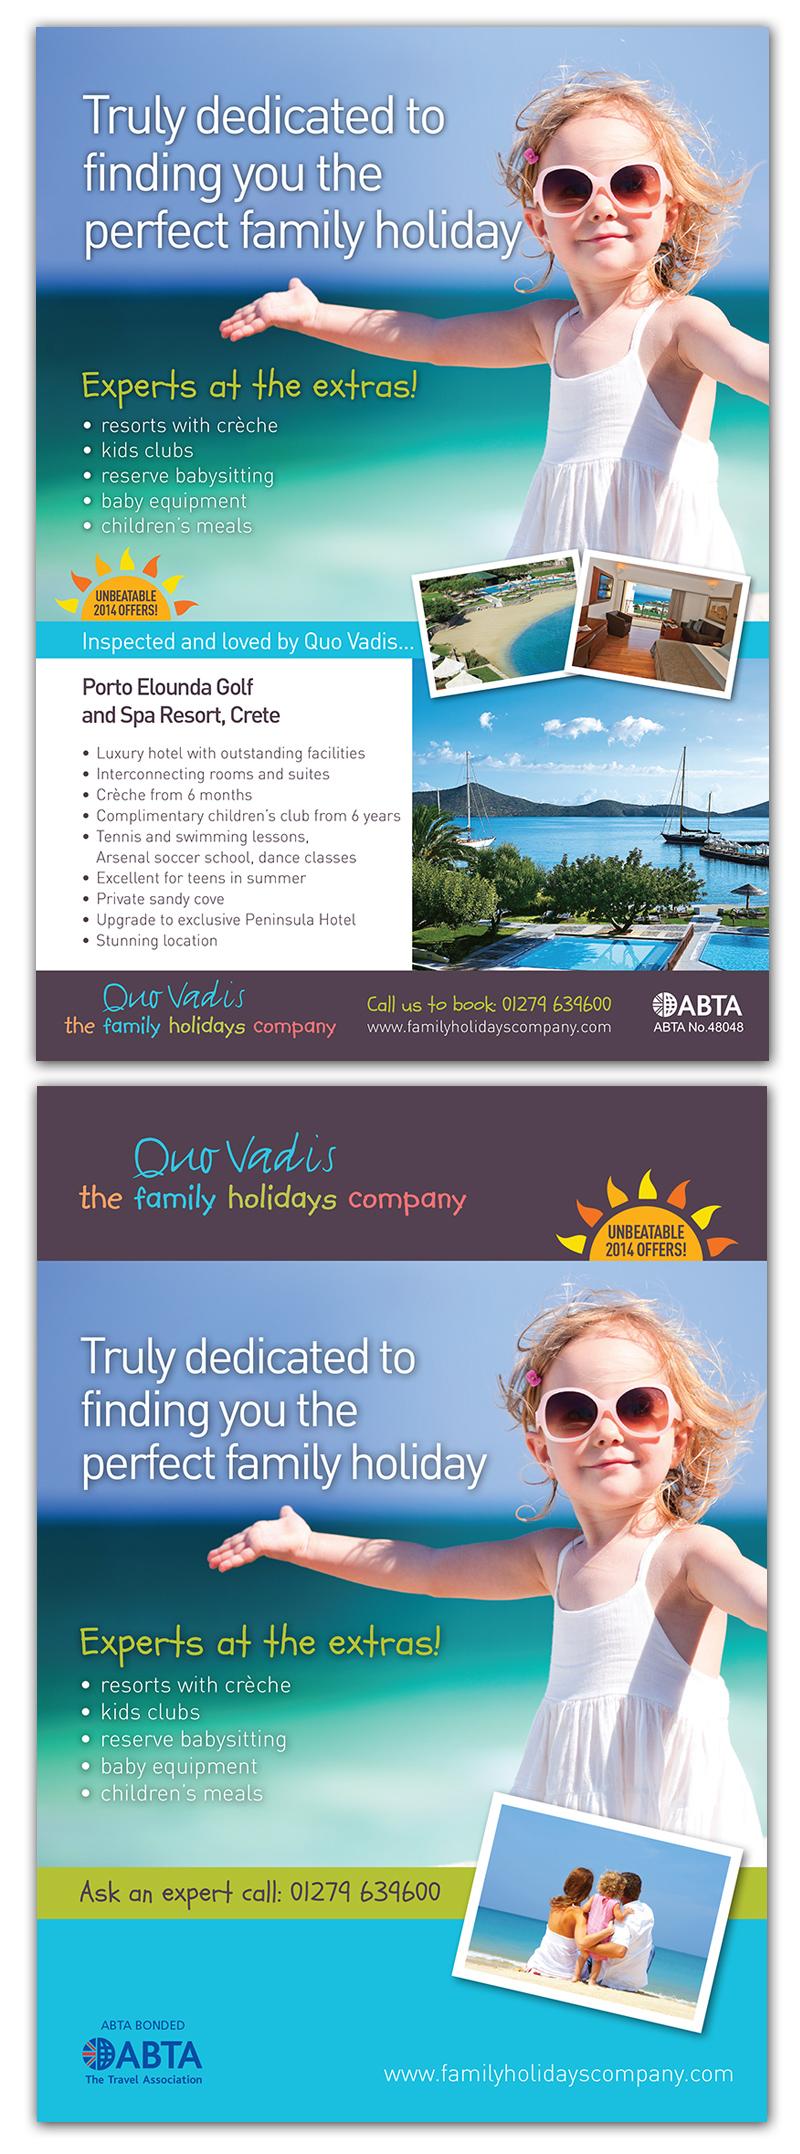 holiday company advertising